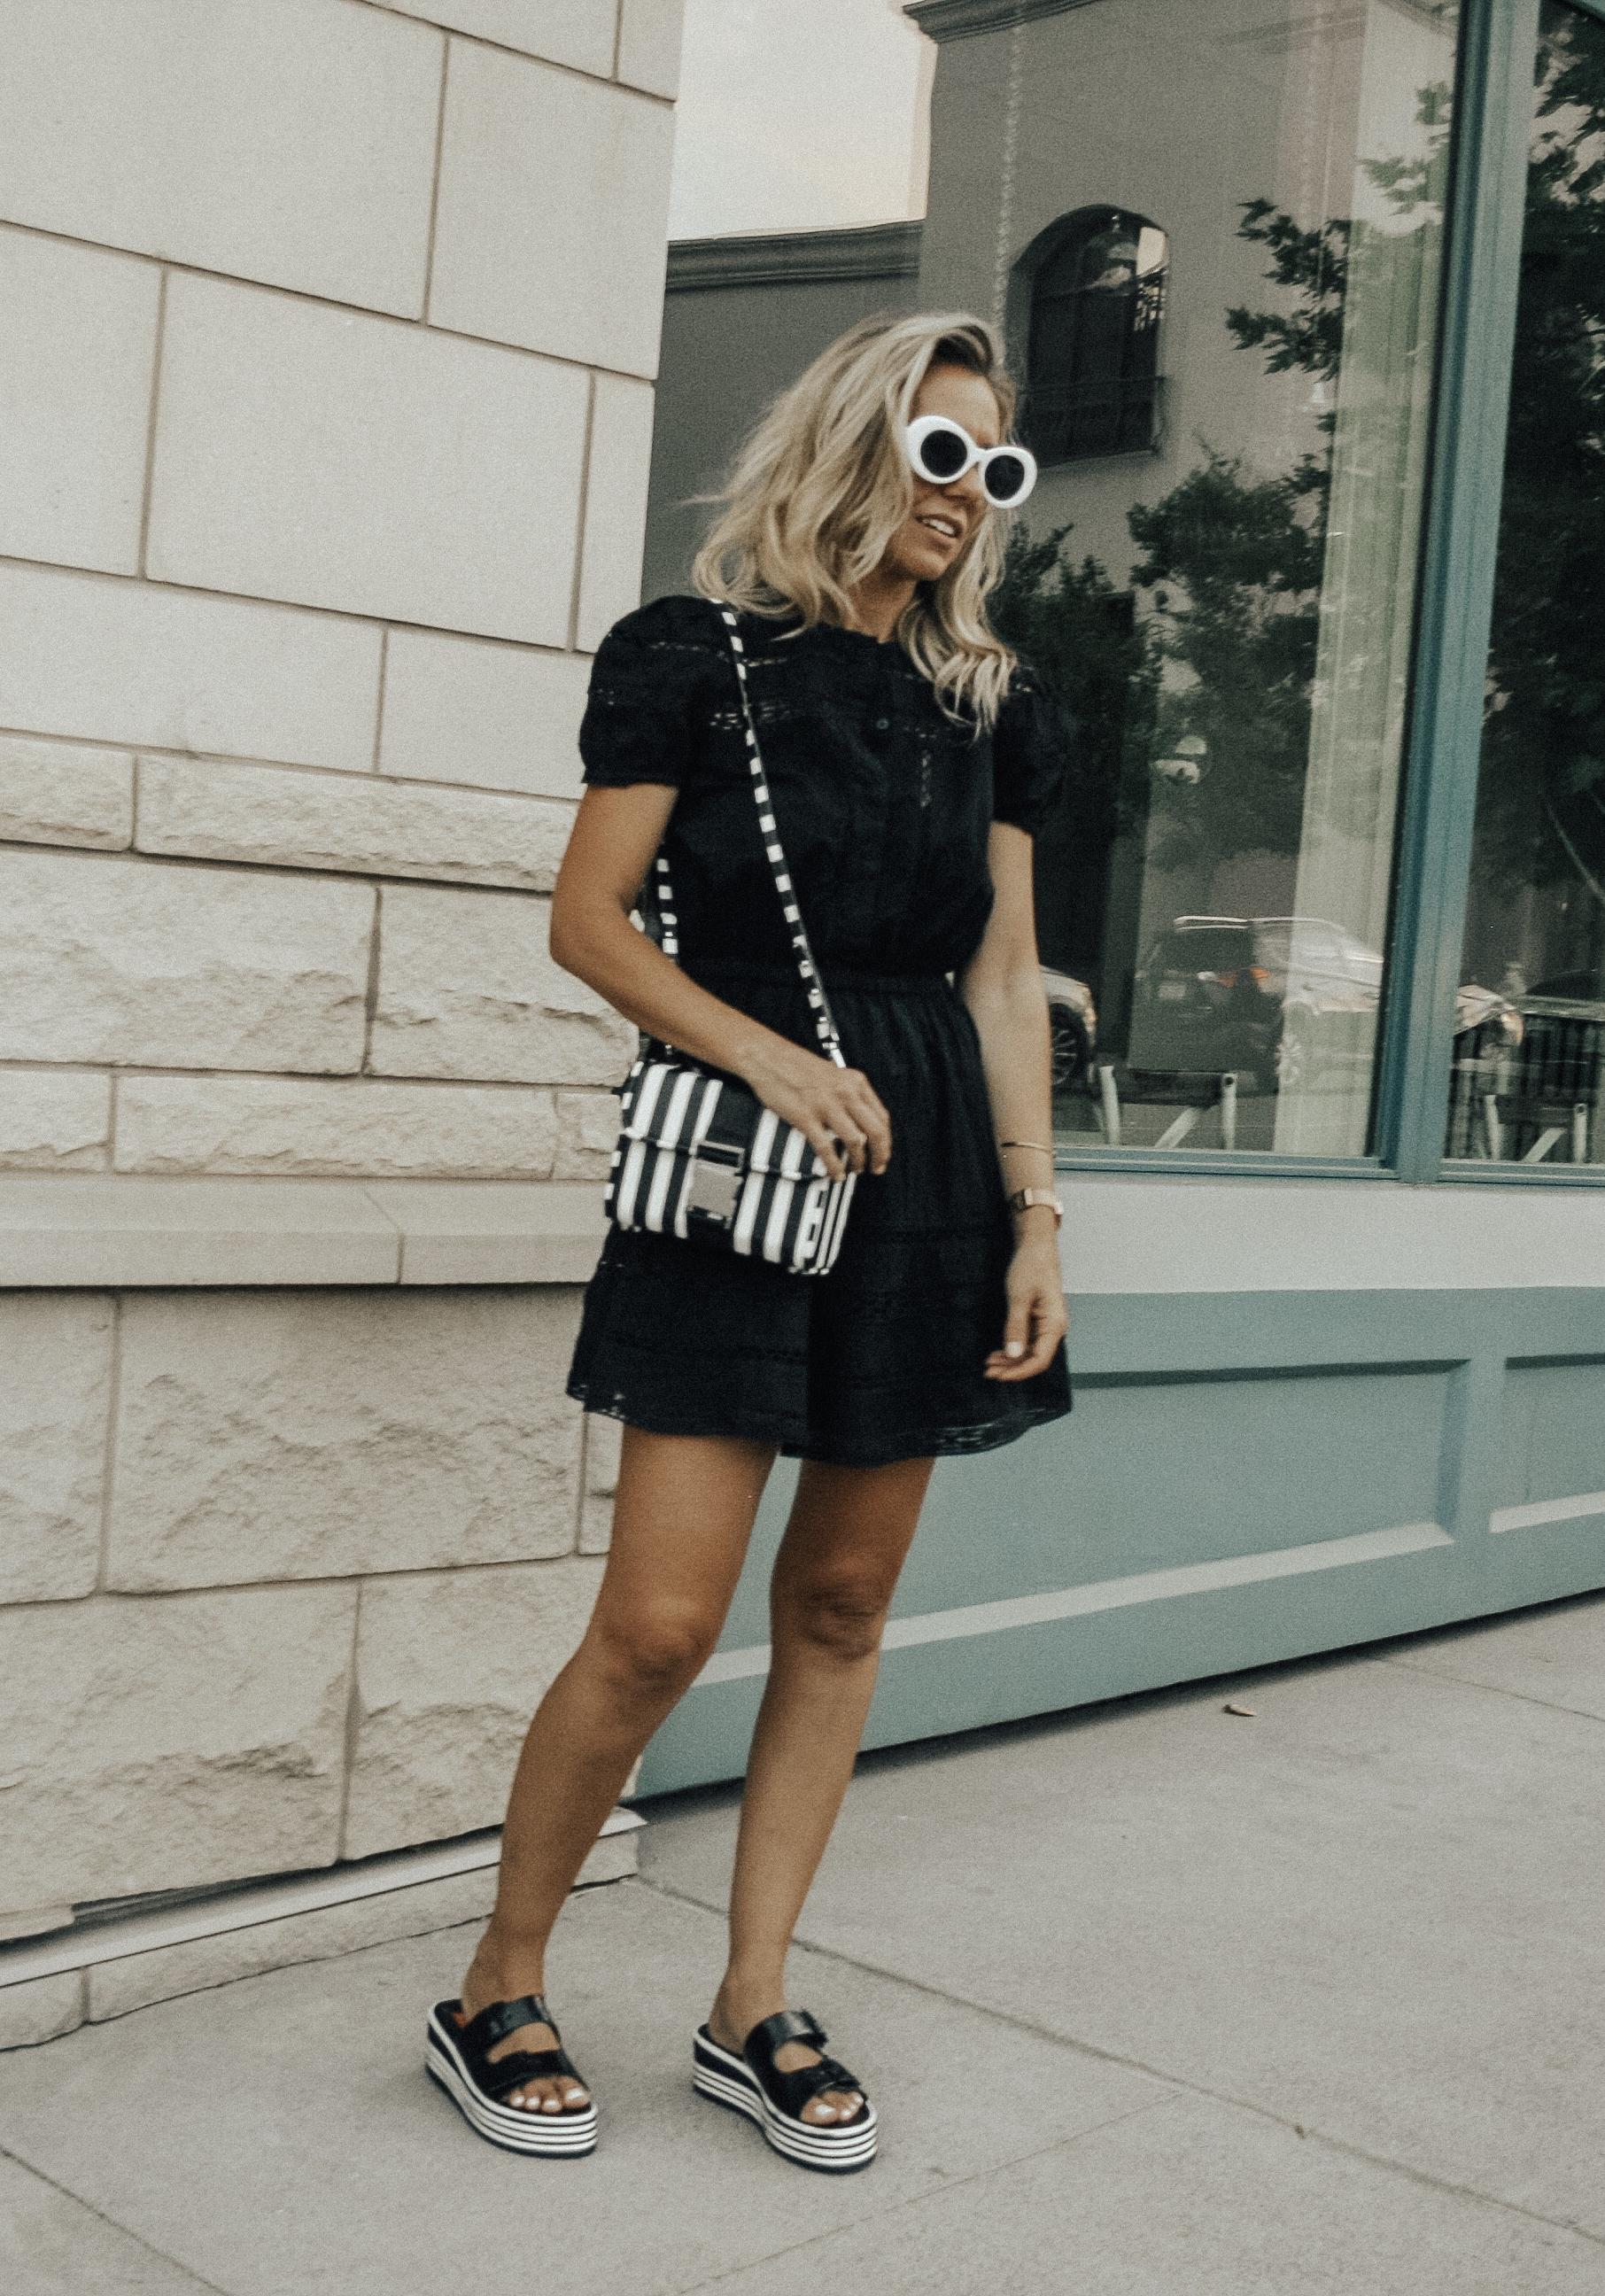 BLACK, WHITE + A LITTLE BIT RETRO- Jaclyn De Leon Style + black lace dress + black and white striped crossbody handbag + platform sandals + retro style sunglasses + urban outfitters + Zara handbag + boho chic street style + summer outfit + style inspiration